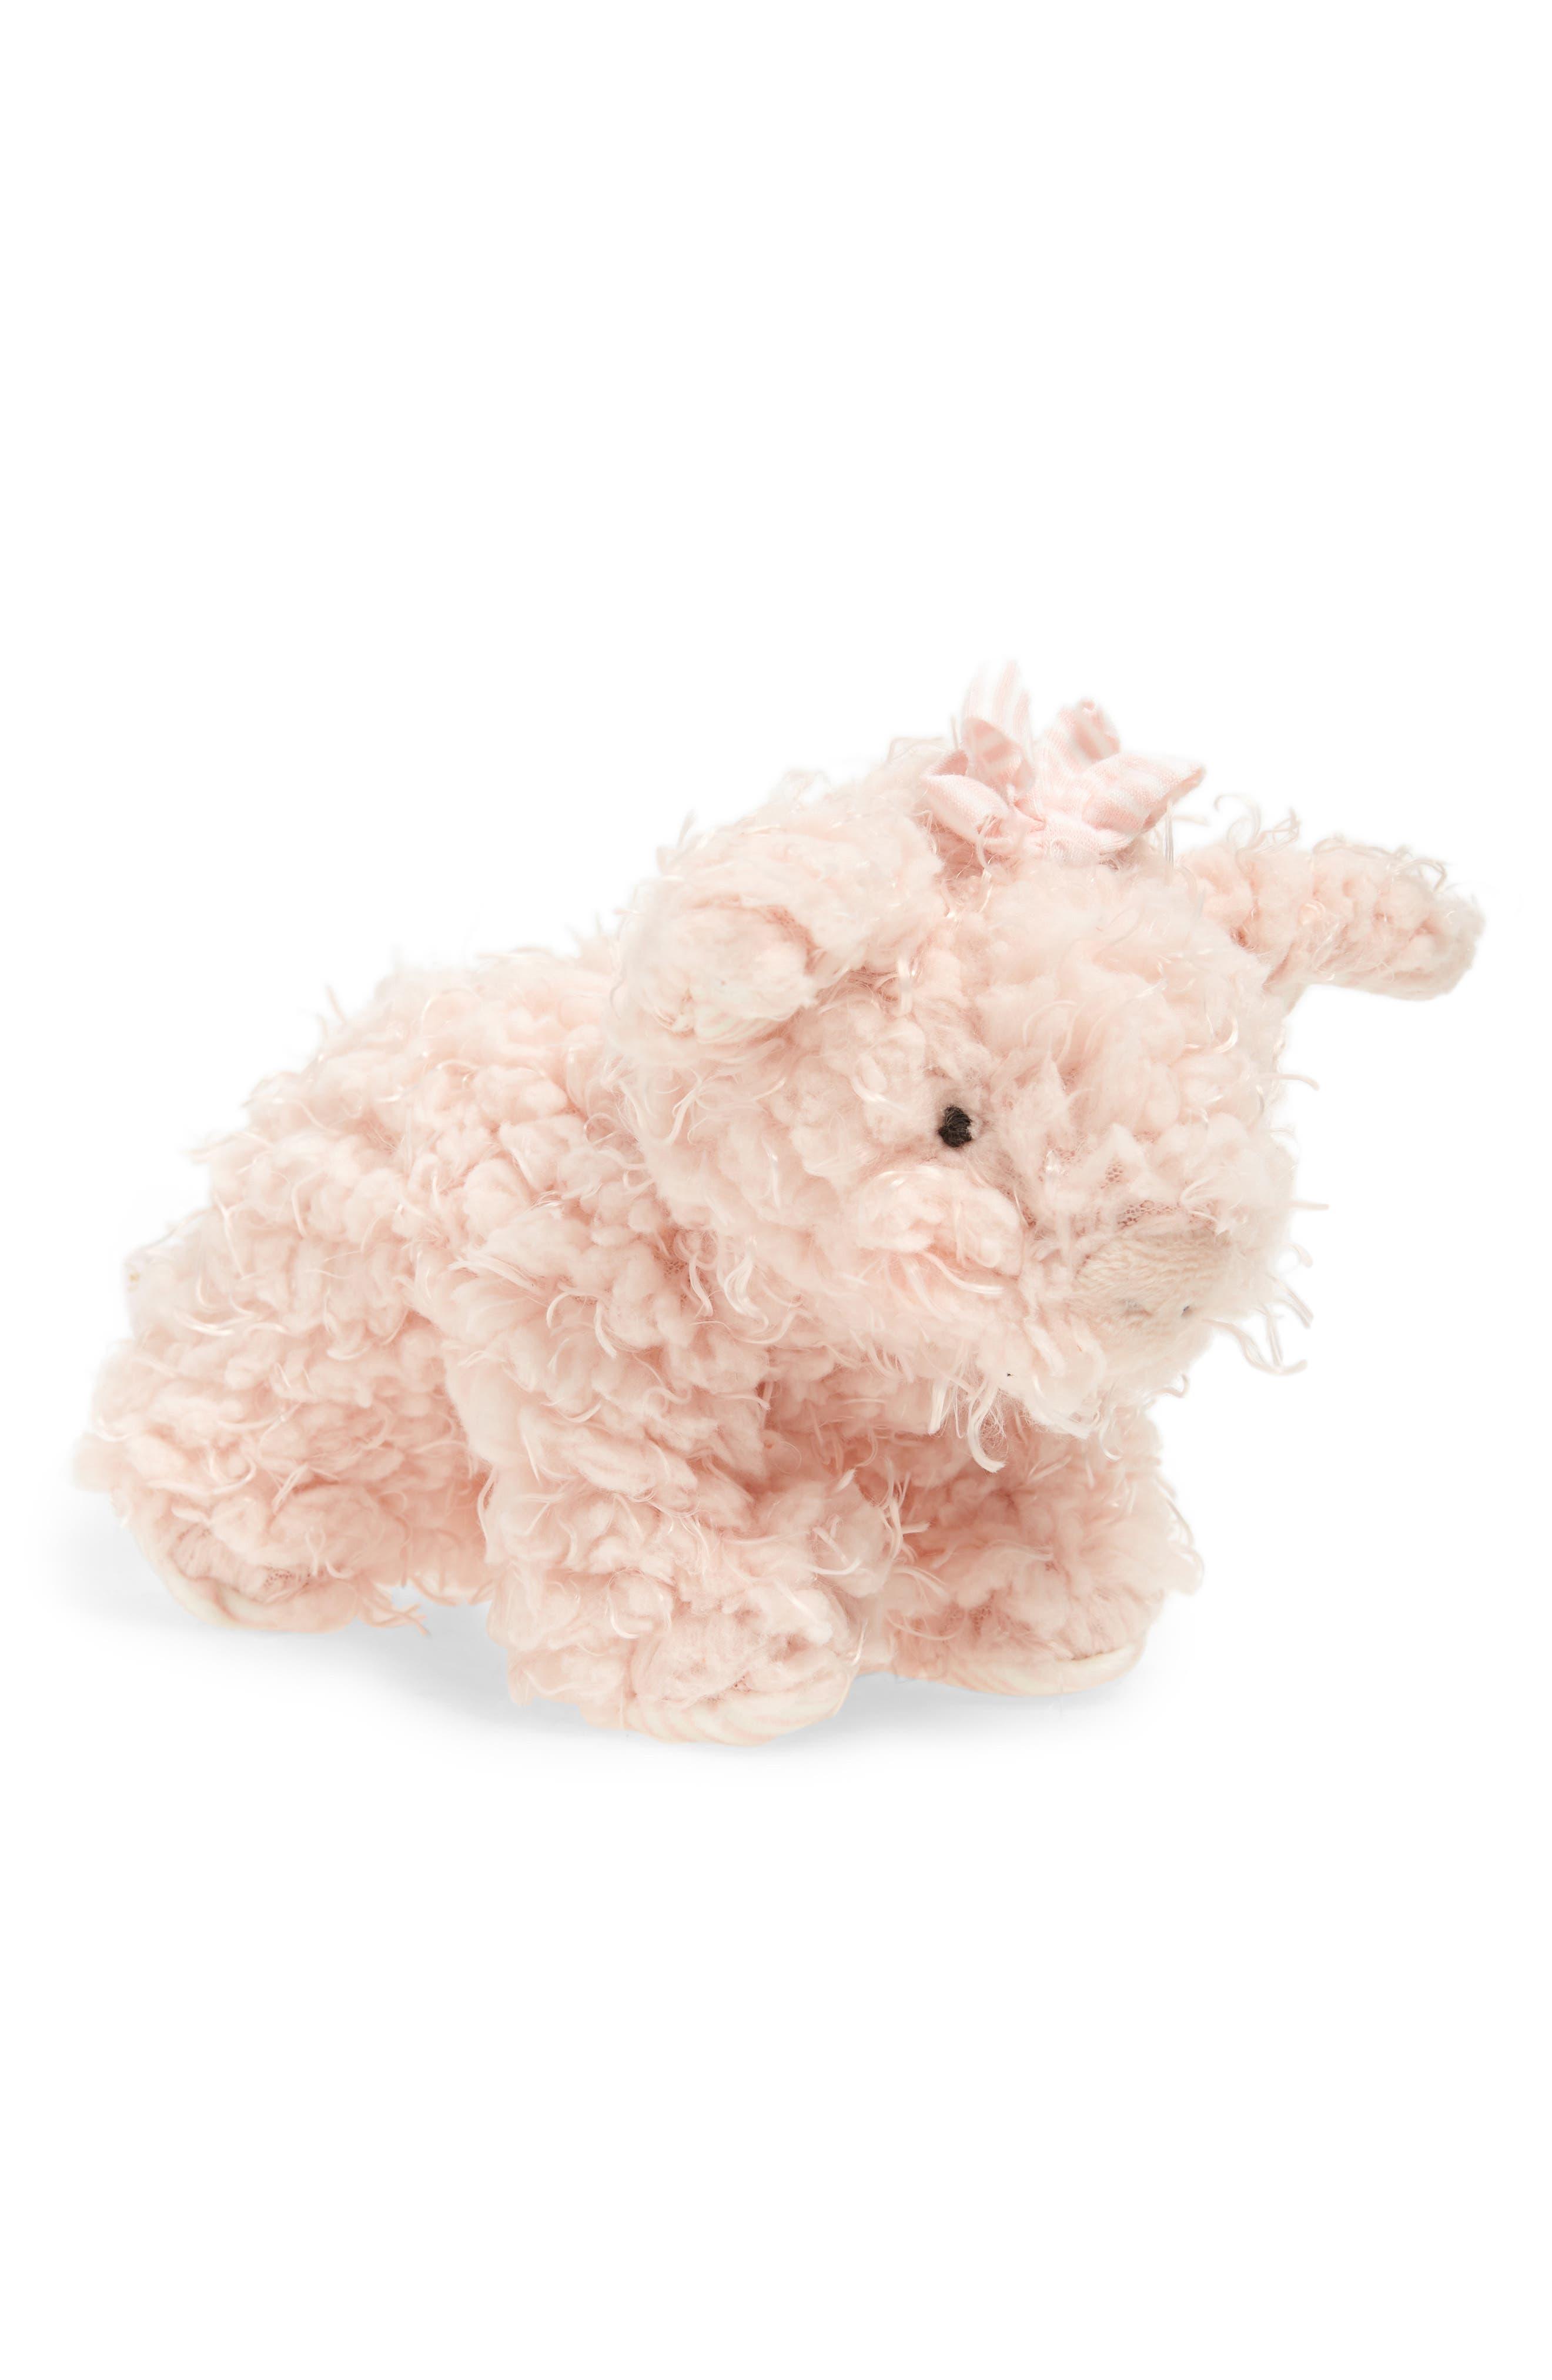 Bunnies by the Bay Patty Pig Stuffed Animal